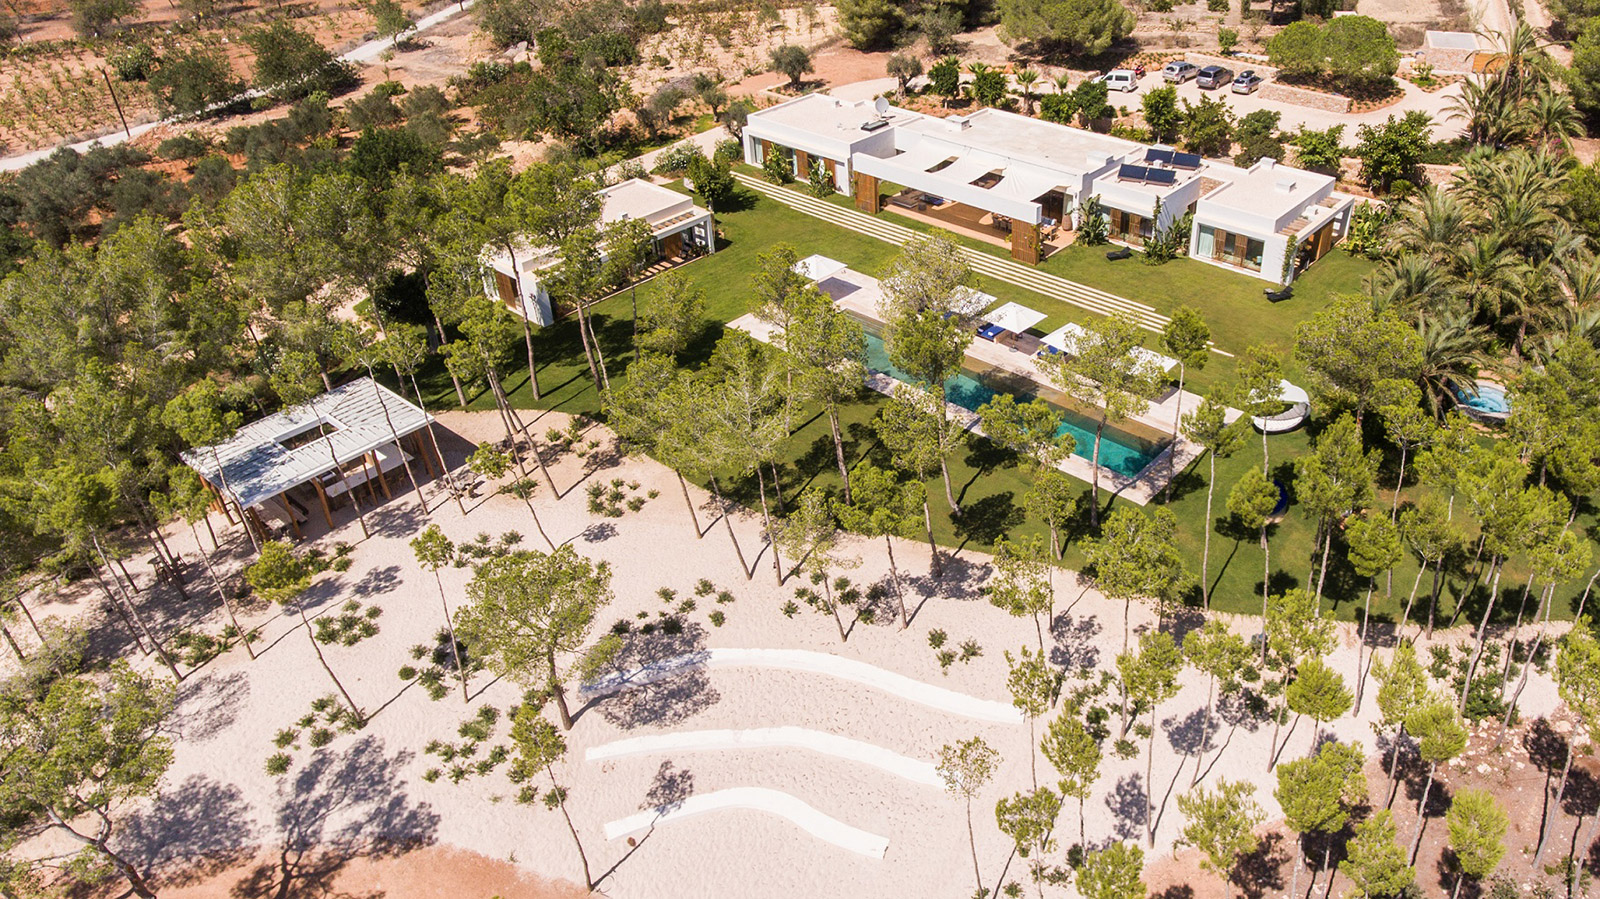 Villa-Na-Xica-4W1A8950